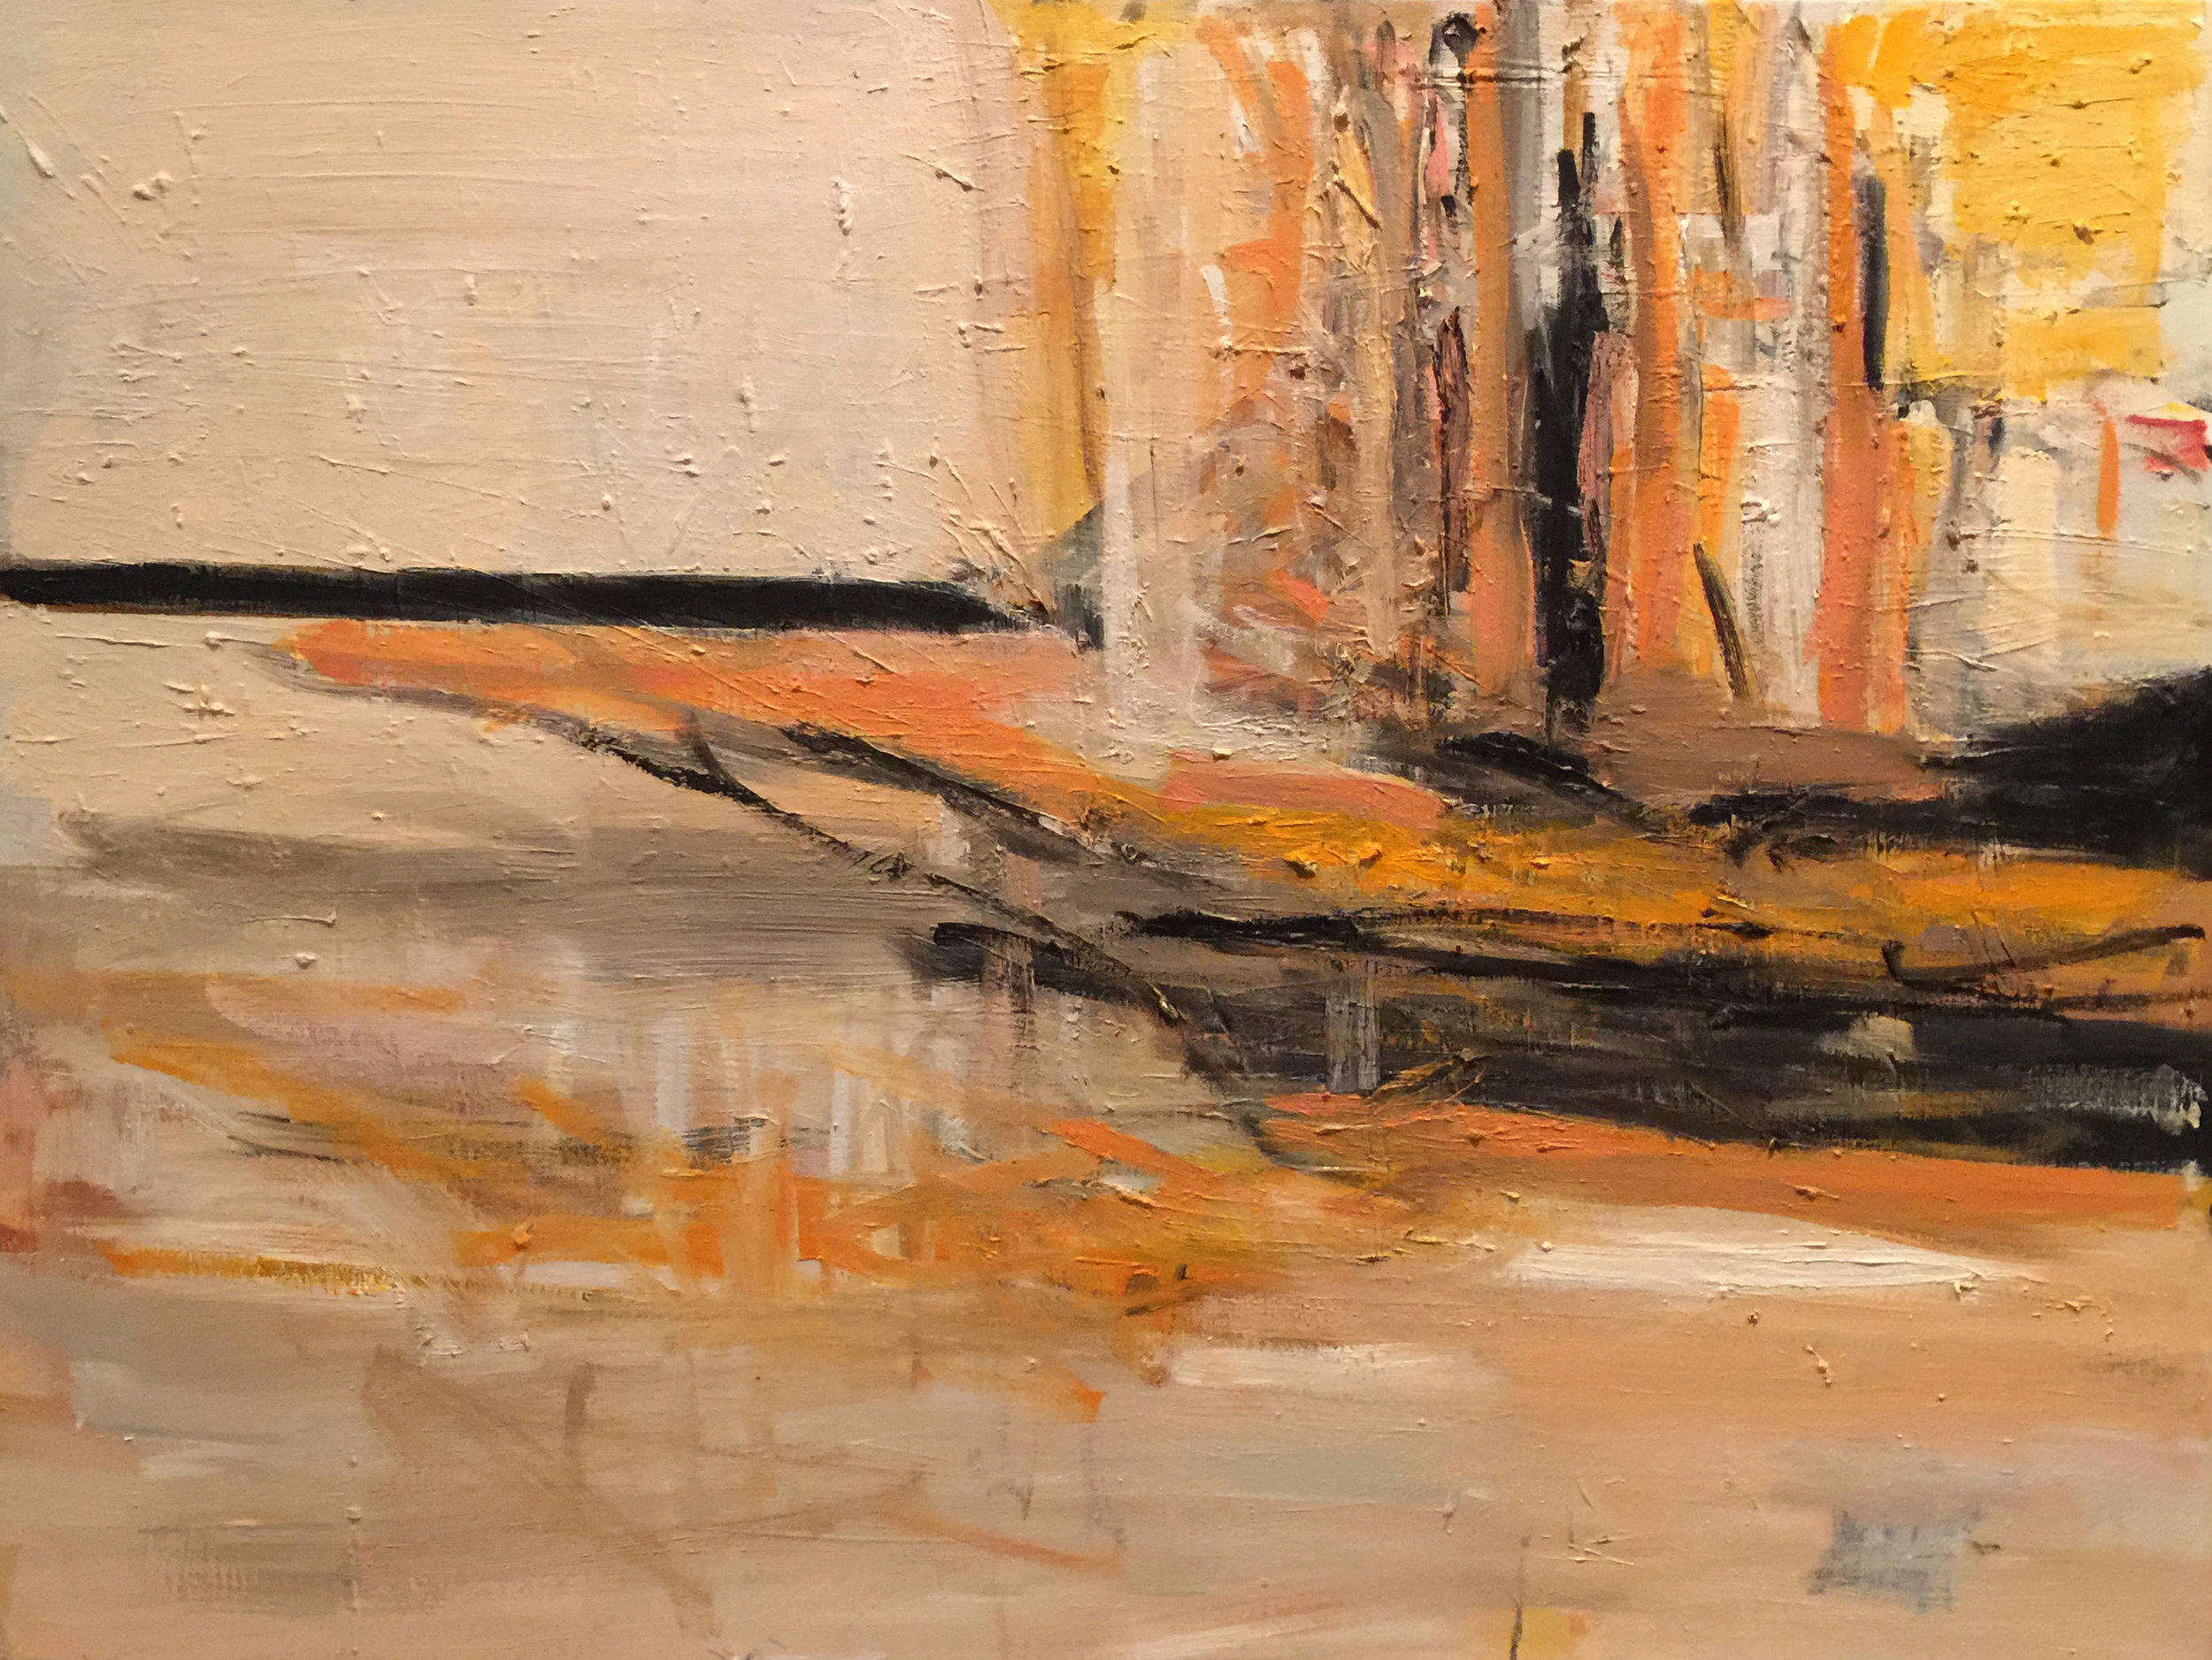 Painting_21_2015-08-23 22.00.25 2.jpg